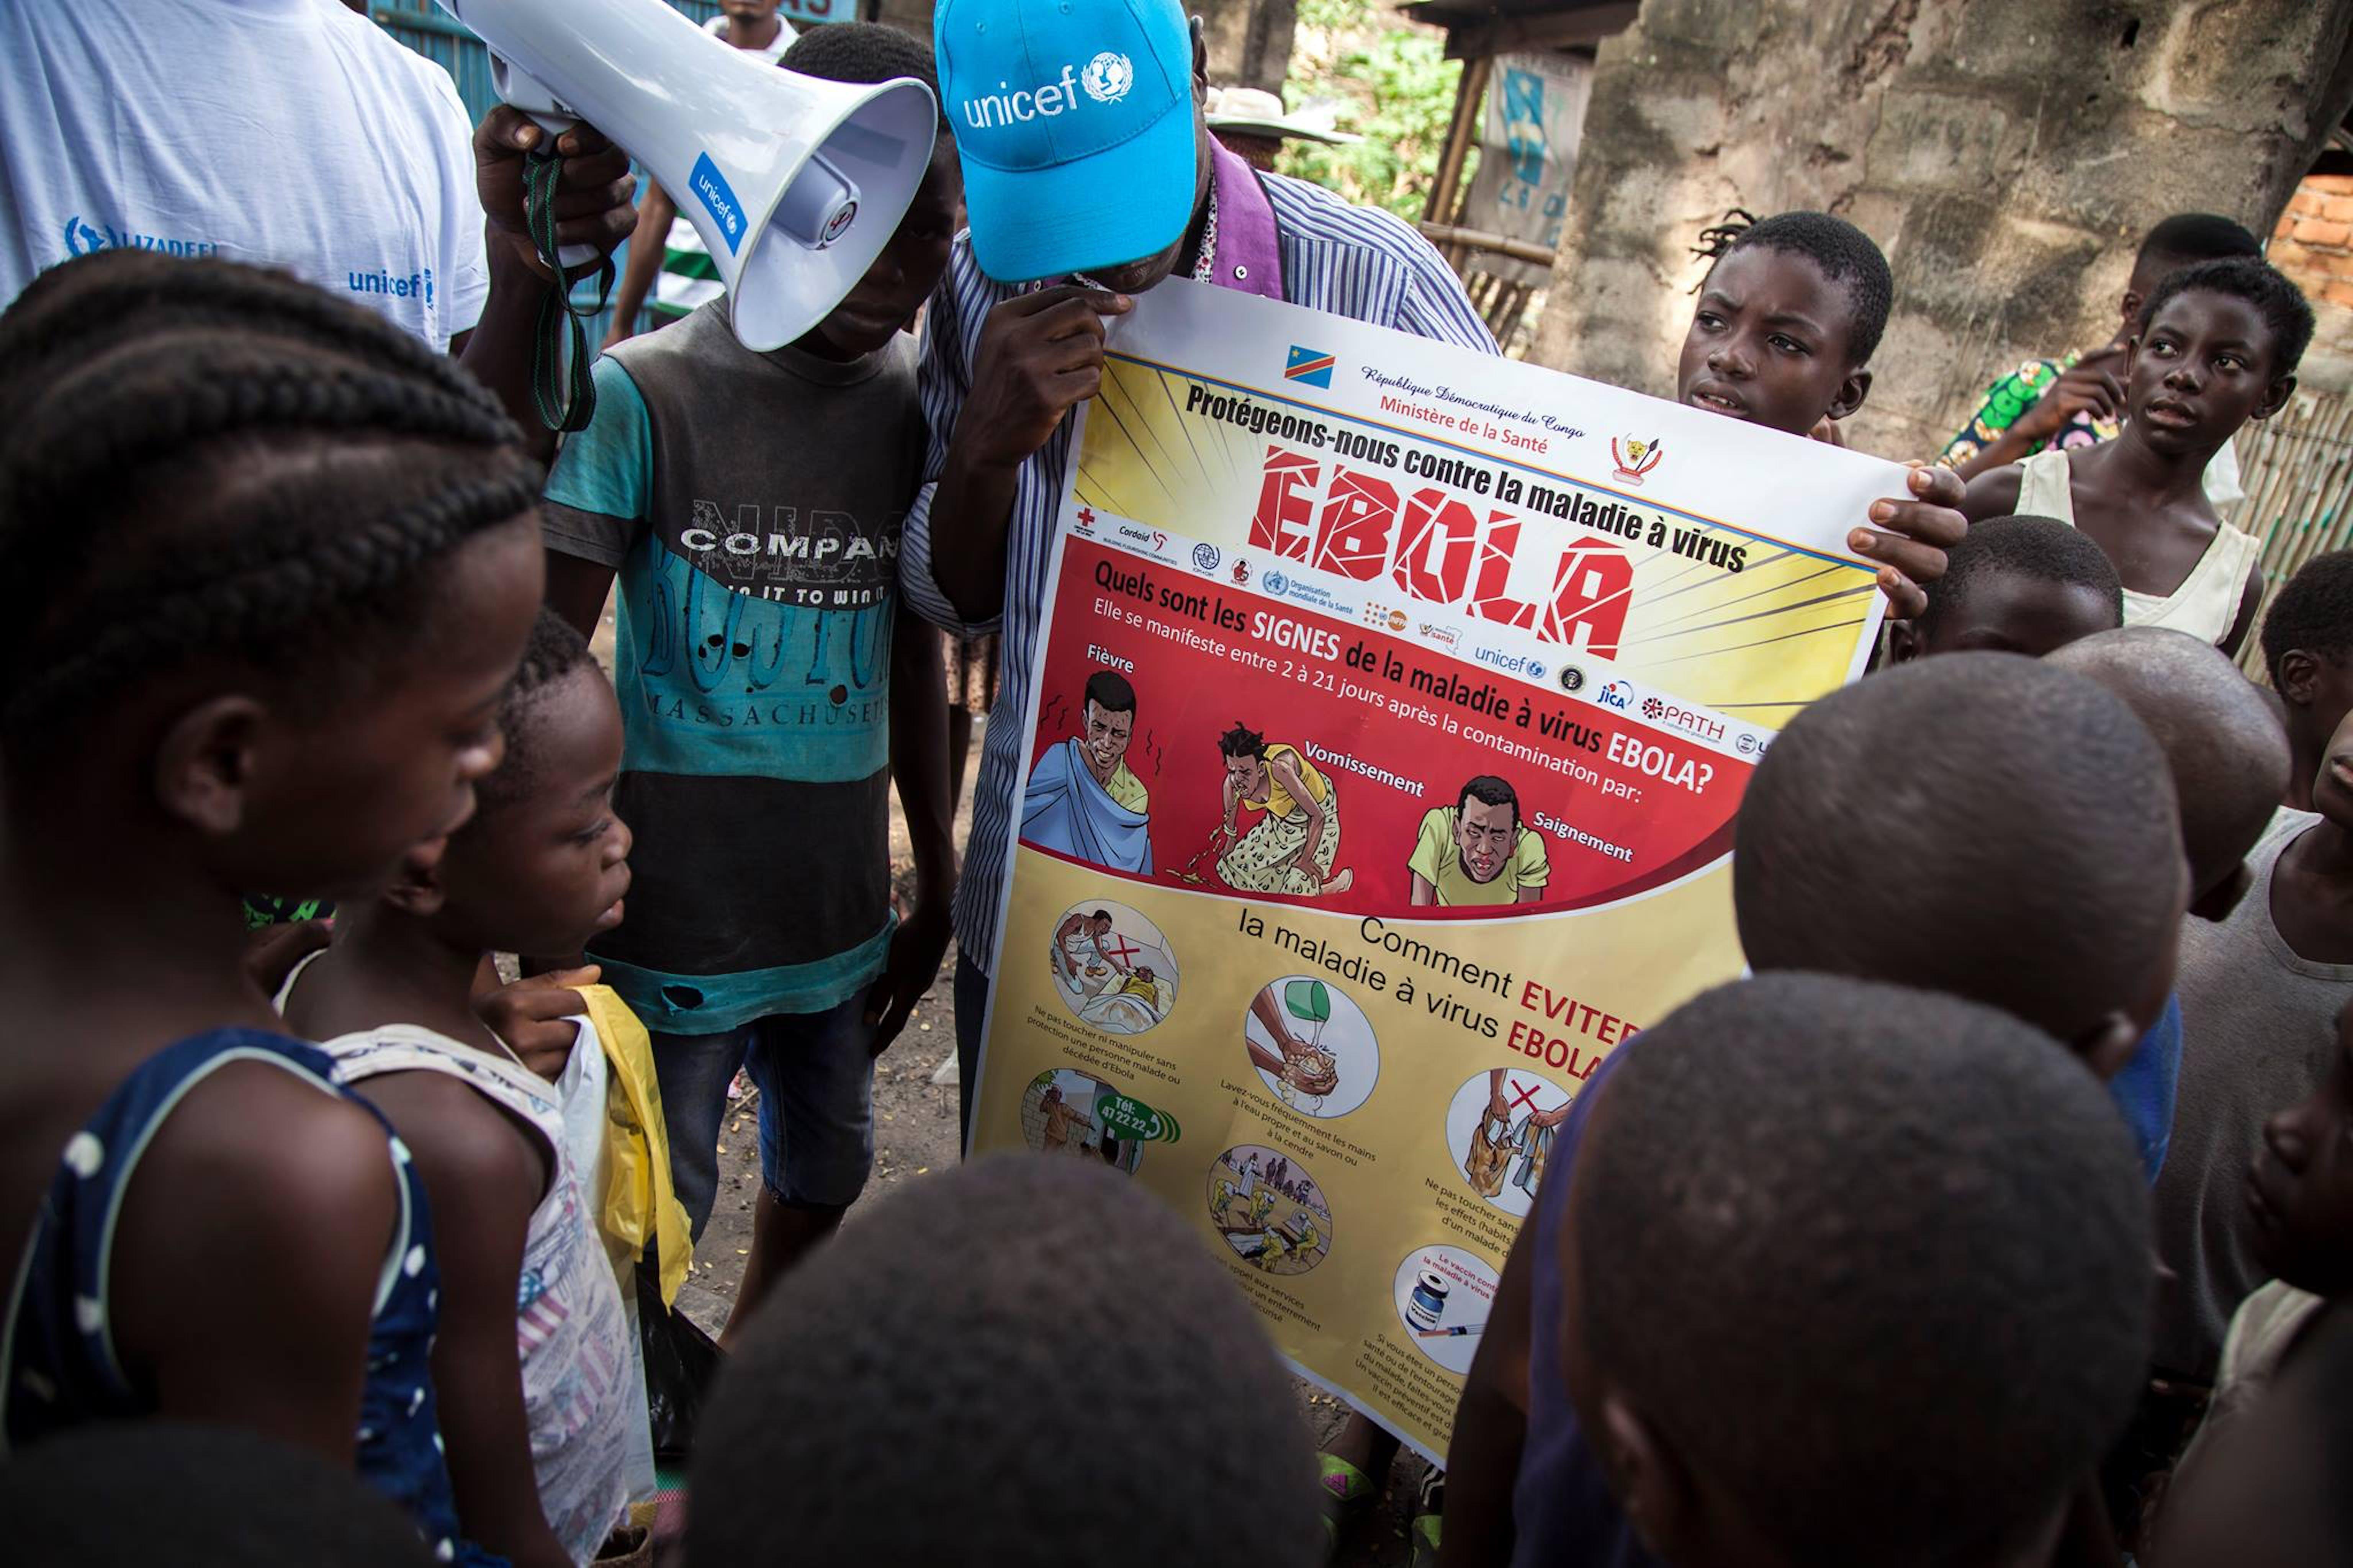 © UNICEF/DR Congo